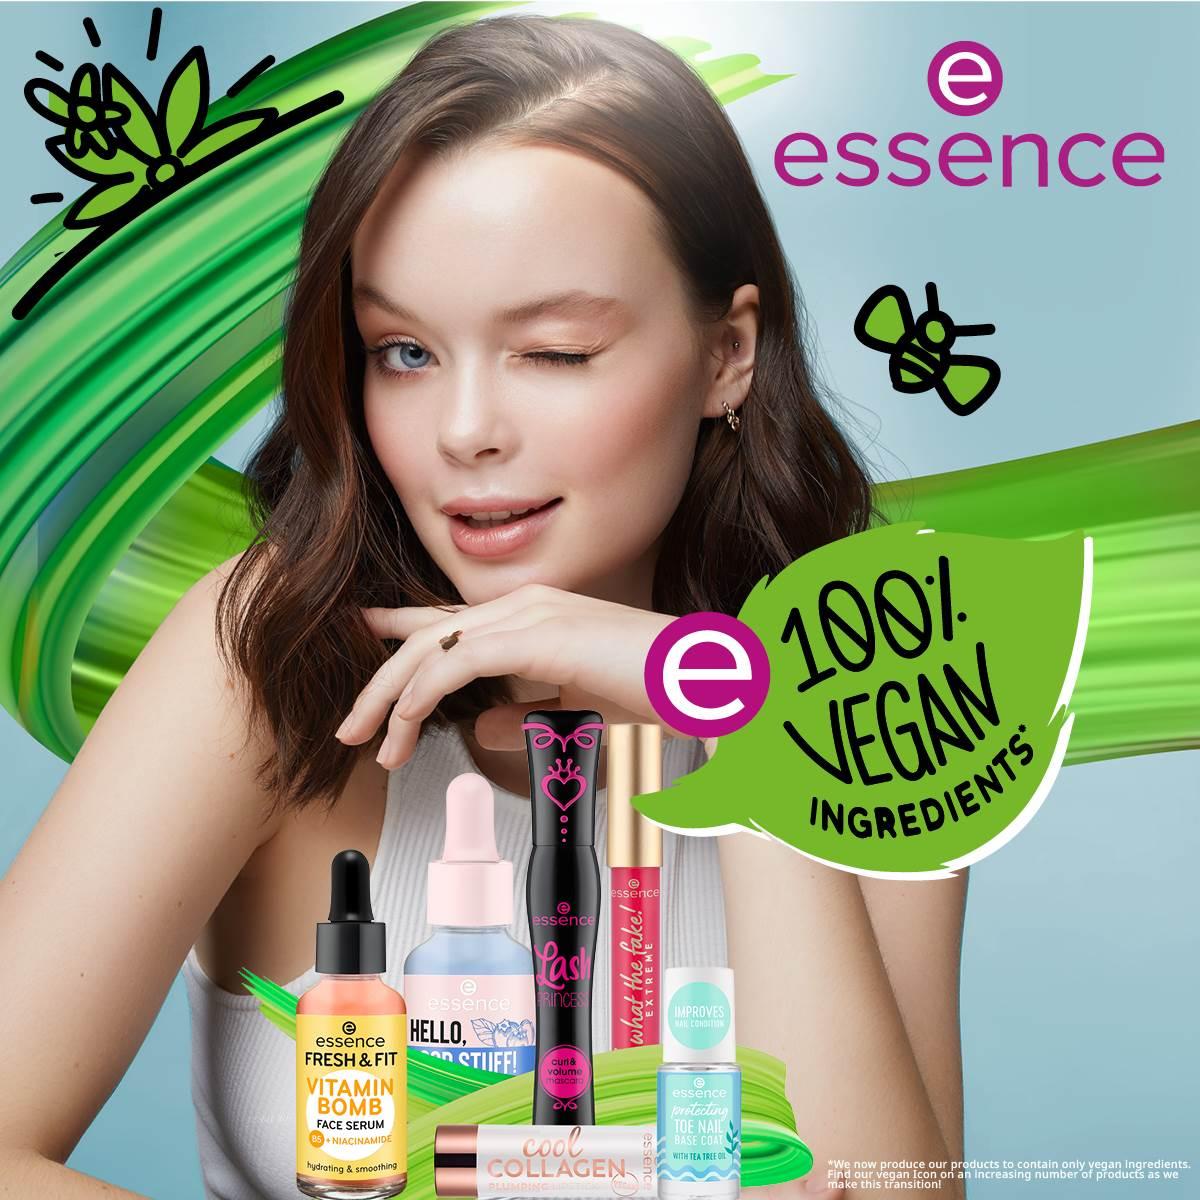 essence_web_Proud To Be Vegan_Vm2 Cosmetics_HR_1200x1200px_270921_ID10485